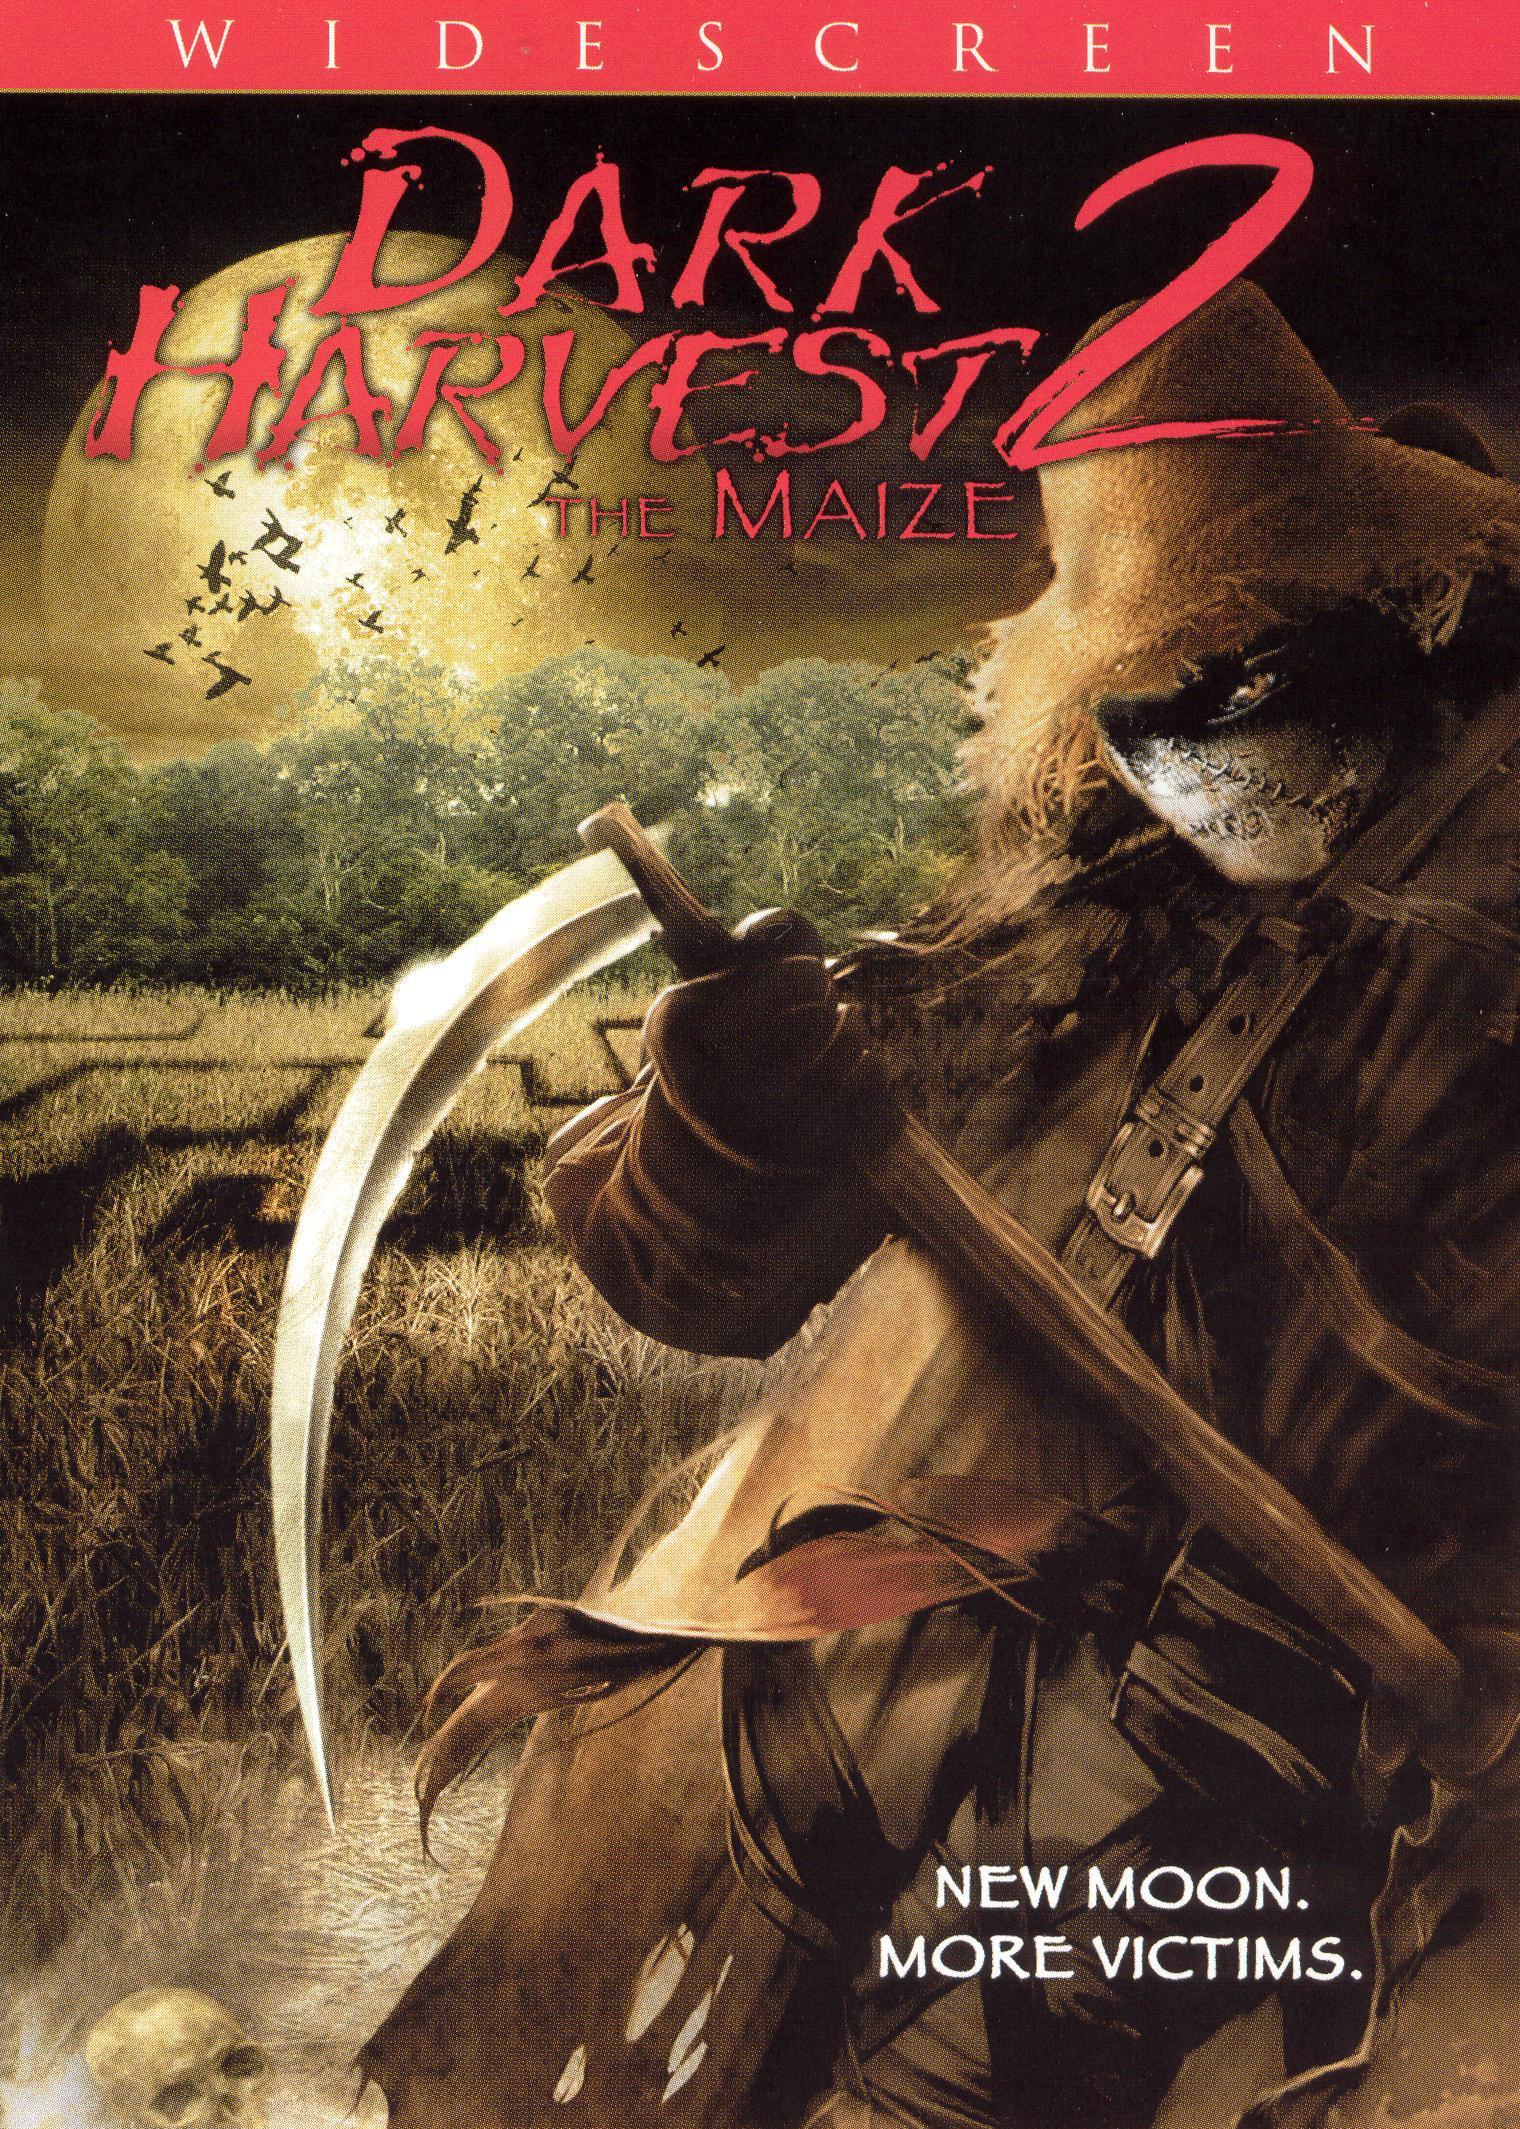 Dark Harvest 2: The Maize